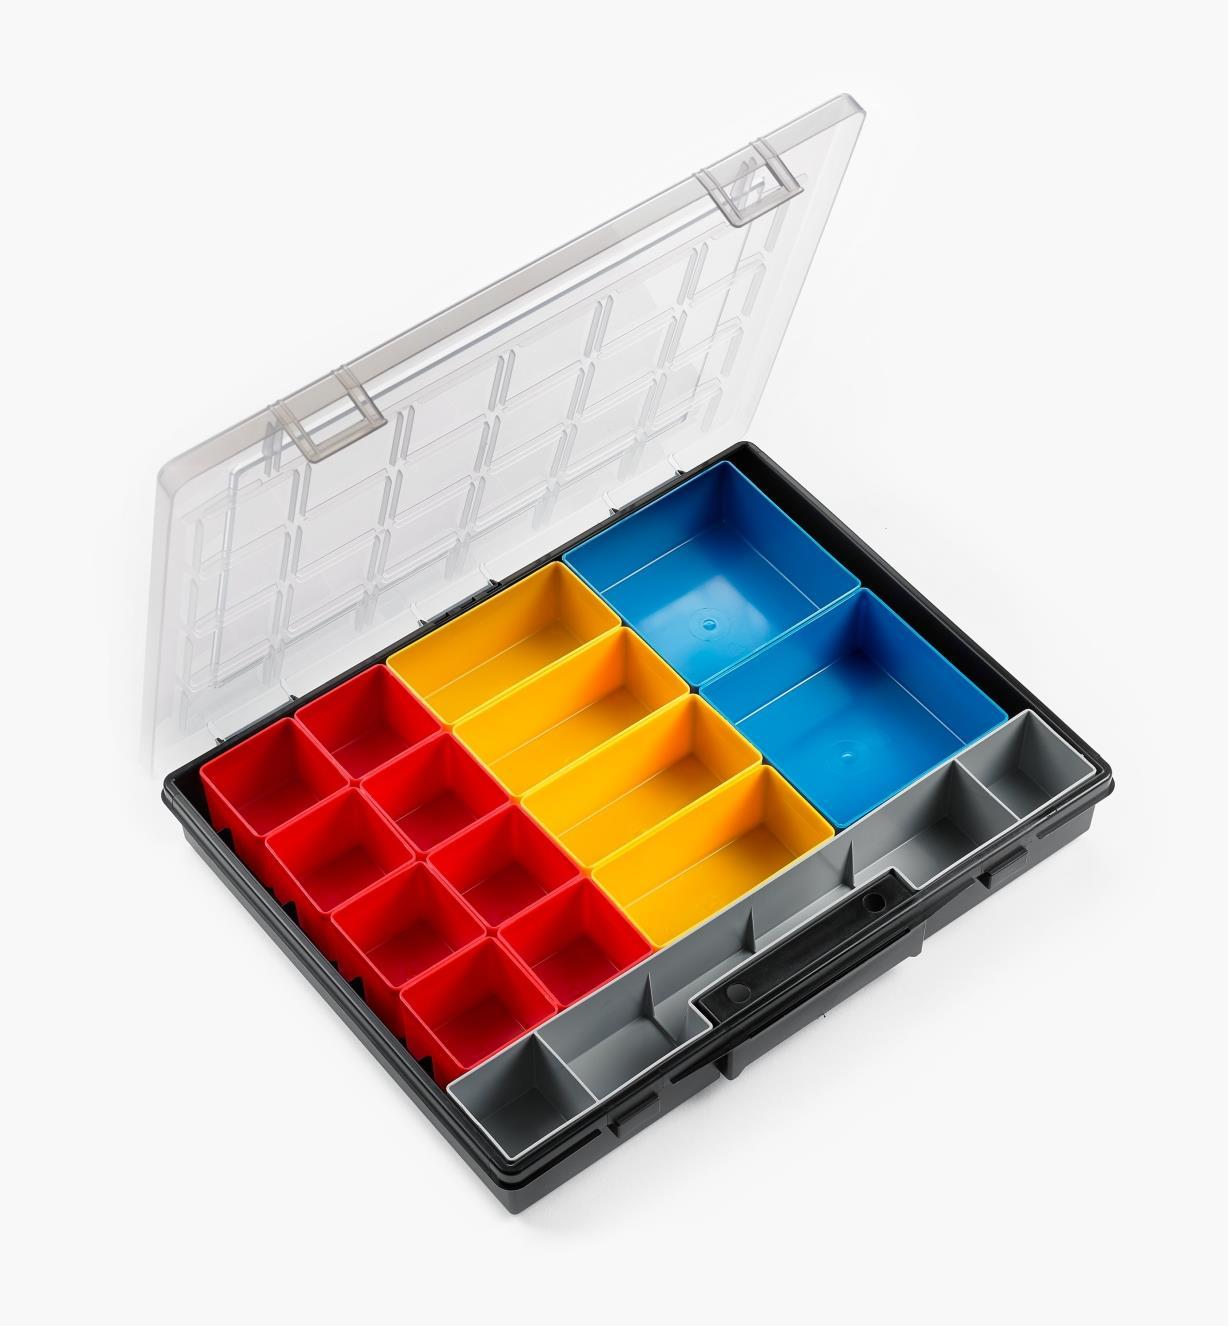 27K8001 - Economy Allit Modular Storage Case, each